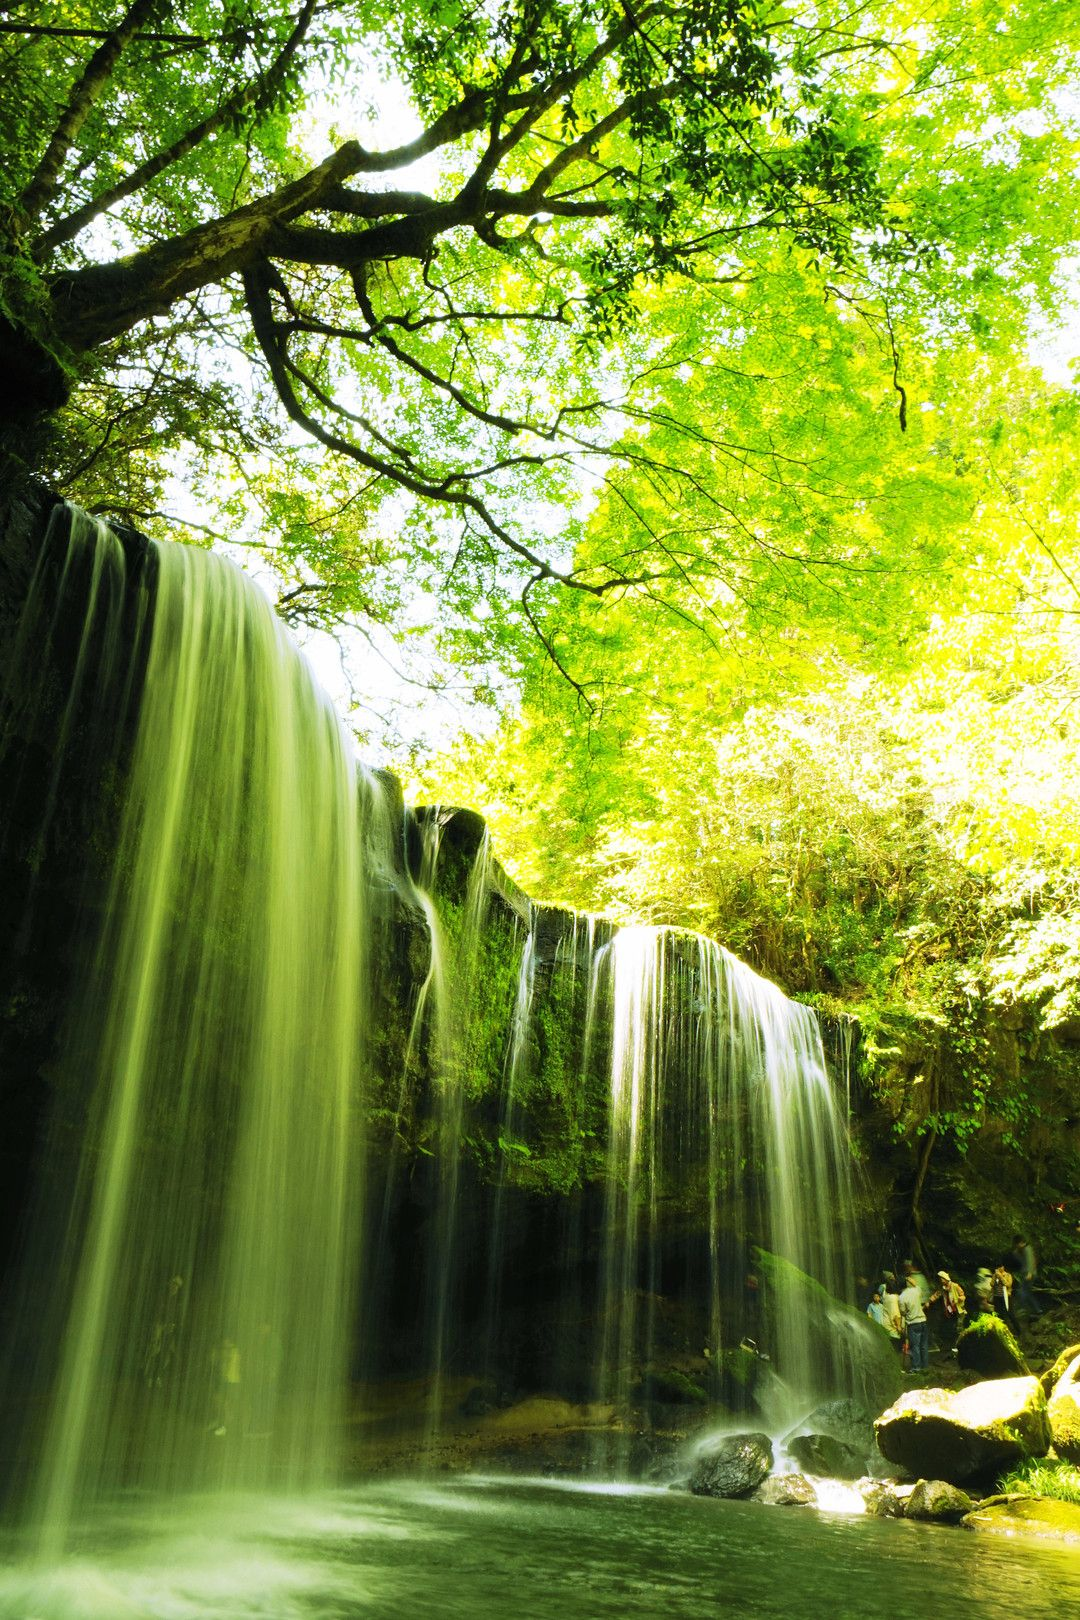 Acafe ソニー Japan Landscape Beautiful Nature Japanese Landscape